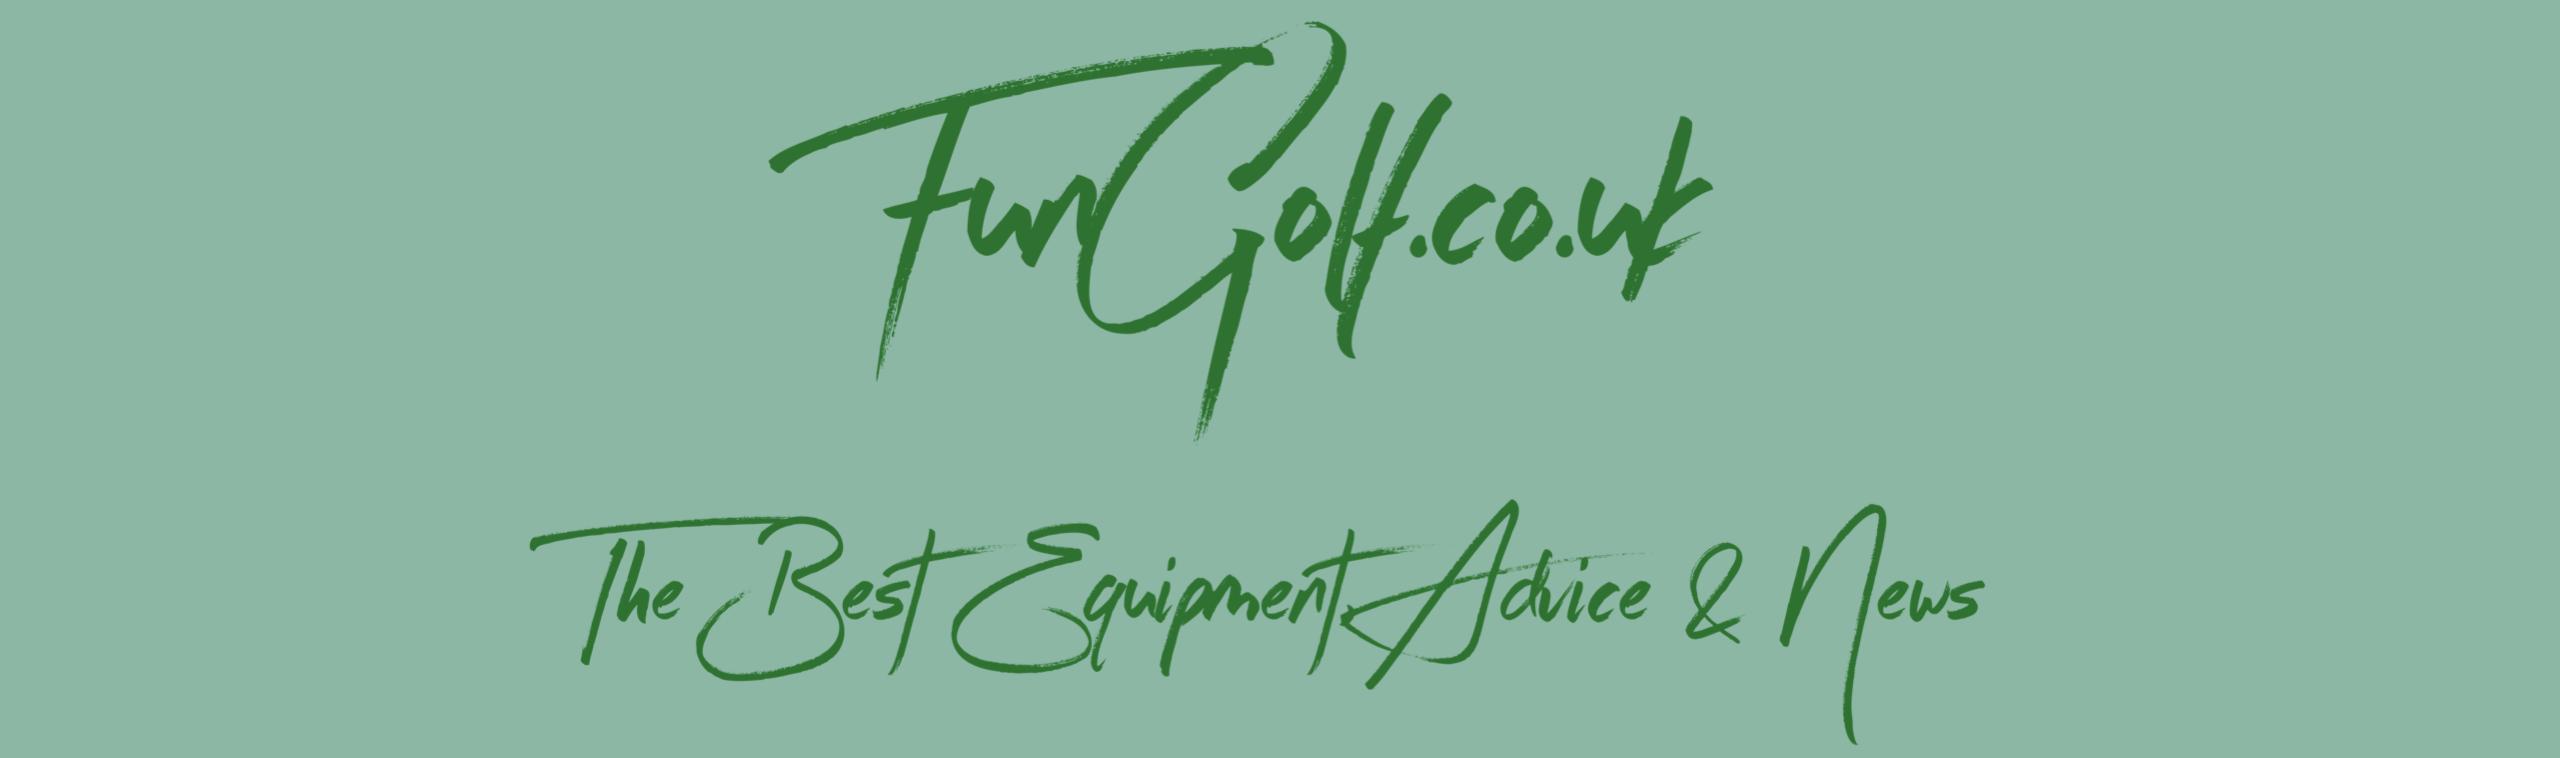 fungolf.co.uk